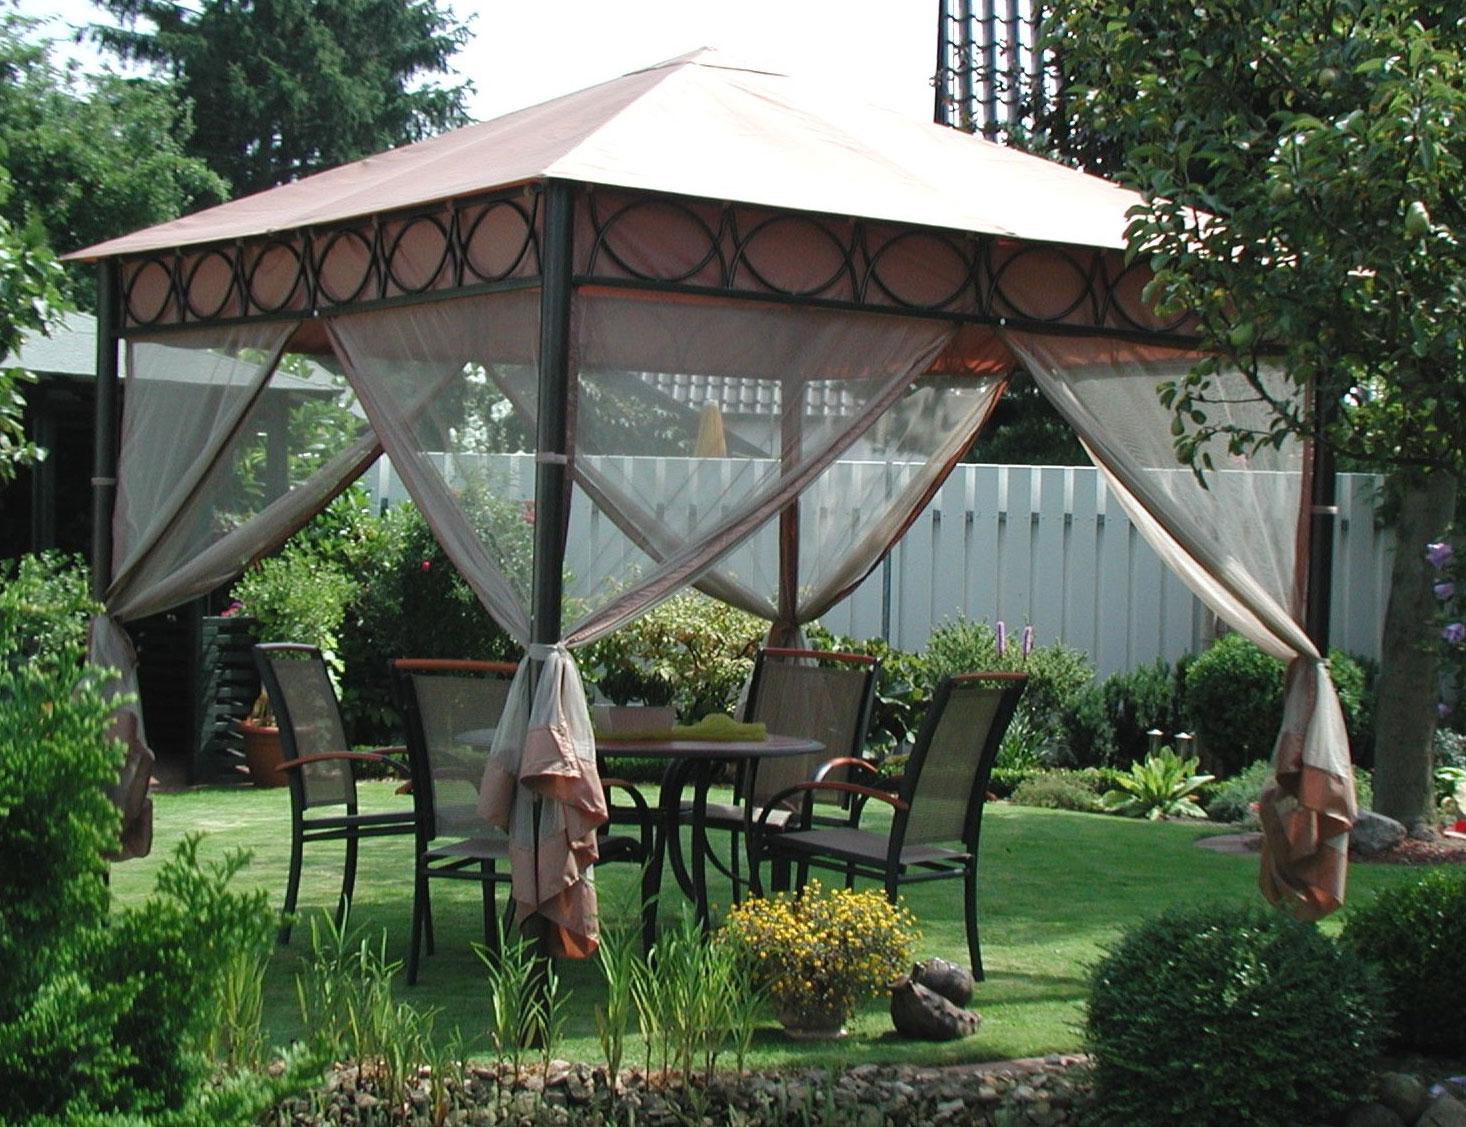 pavillon gartenpavillon safari 300x300cm altkupfer. Black Bedroom Furniture Sets. Home Design Ideas